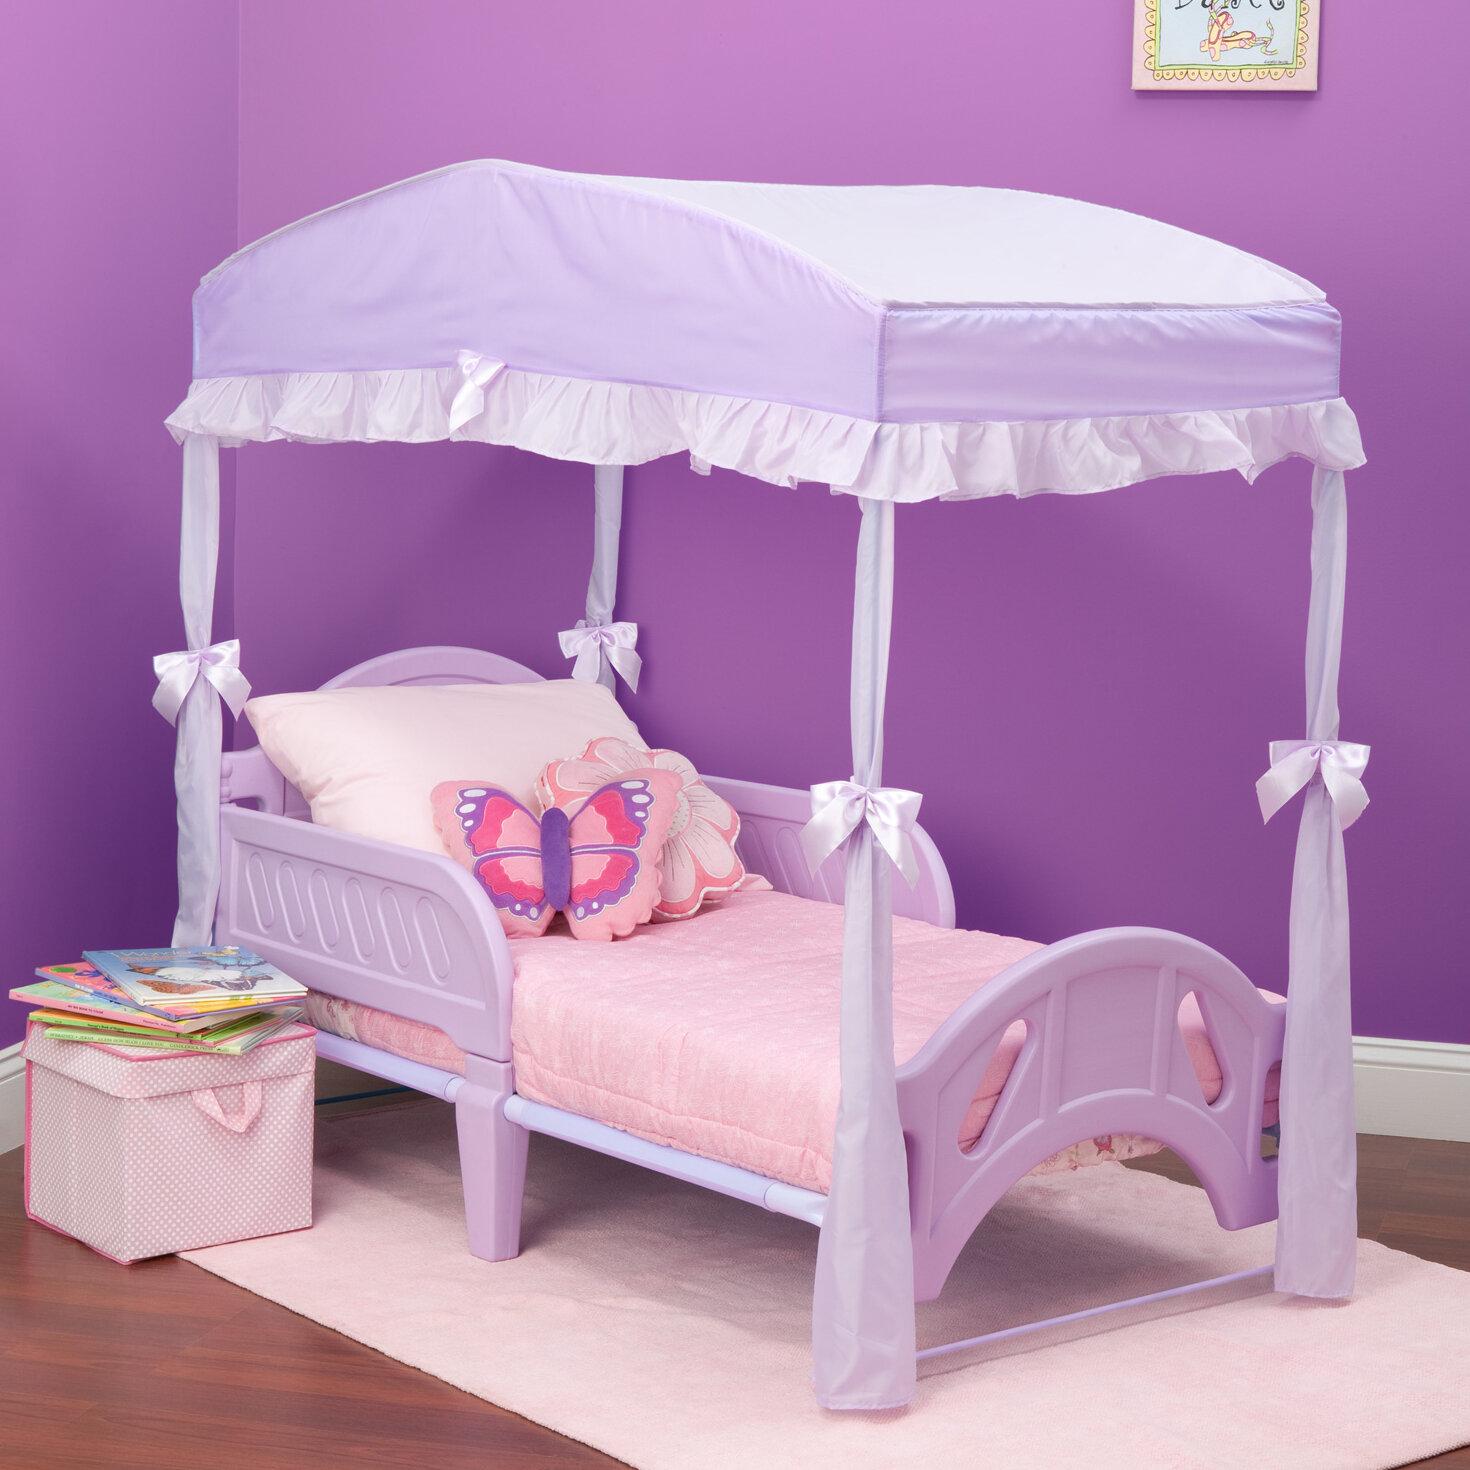 Delta children childrens girls canopy for toddler bed reviews wayfair